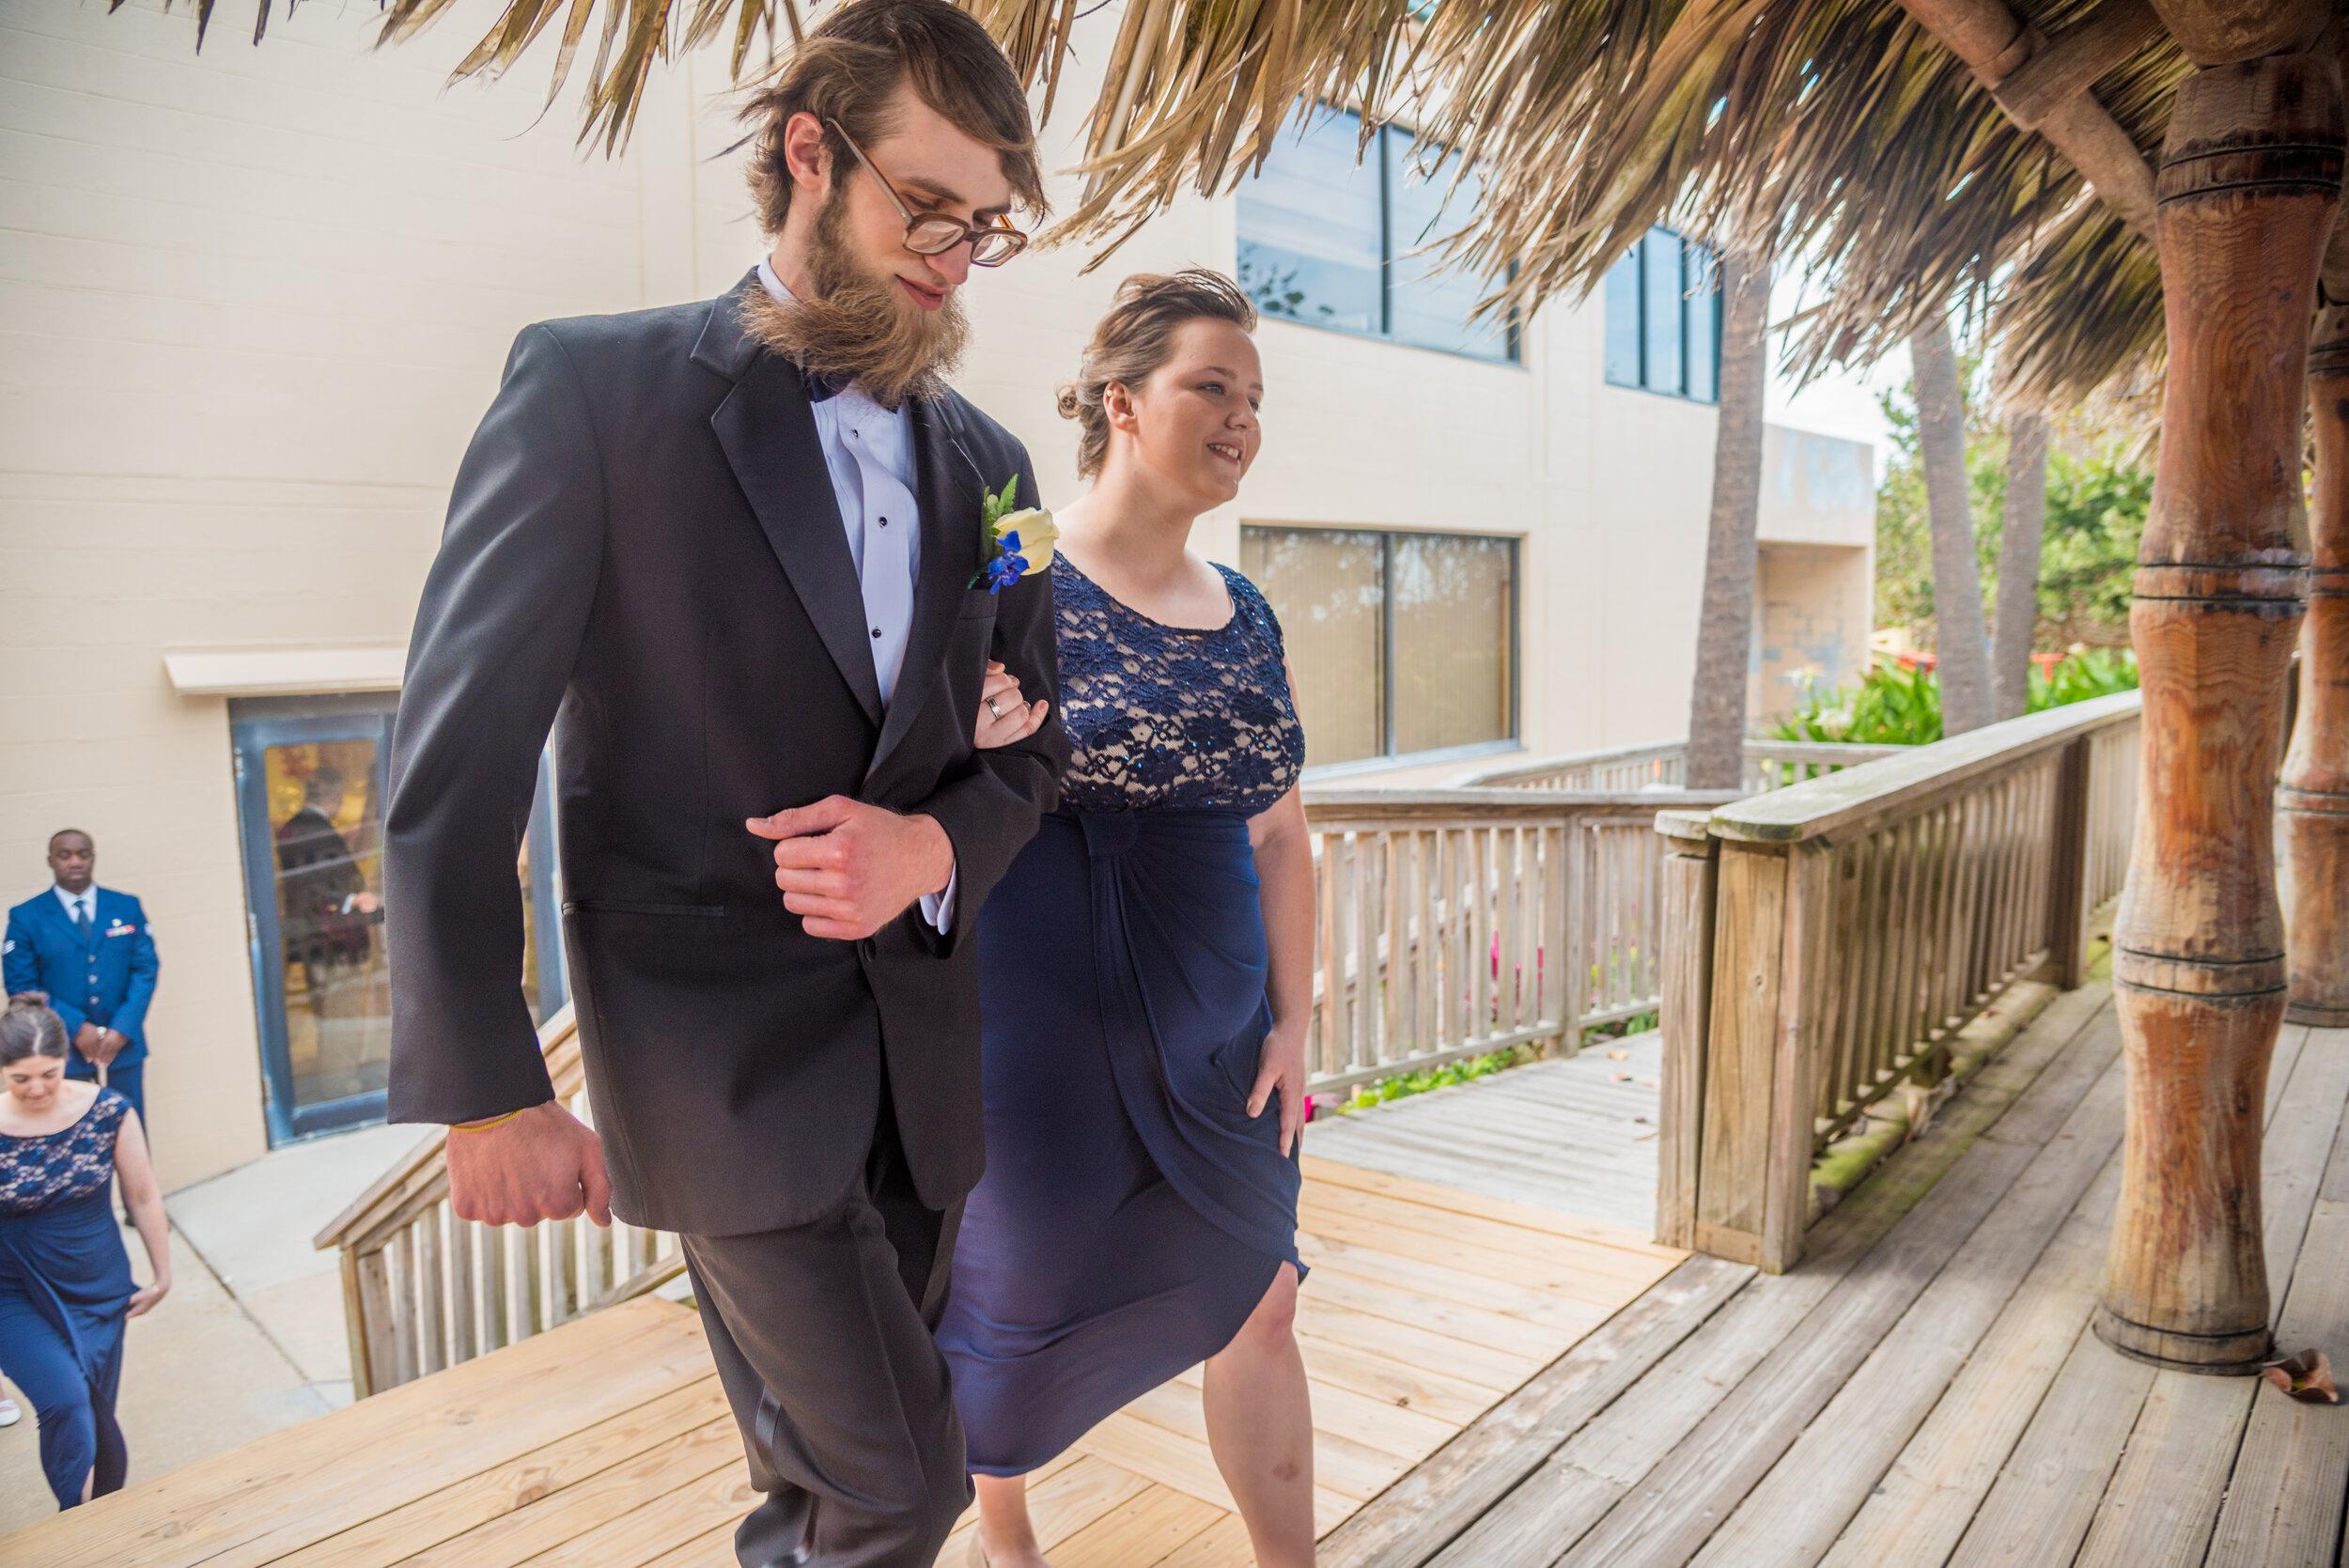 andru-the-tide-club-air-force-wedding-patrickafb-1-20.jpg